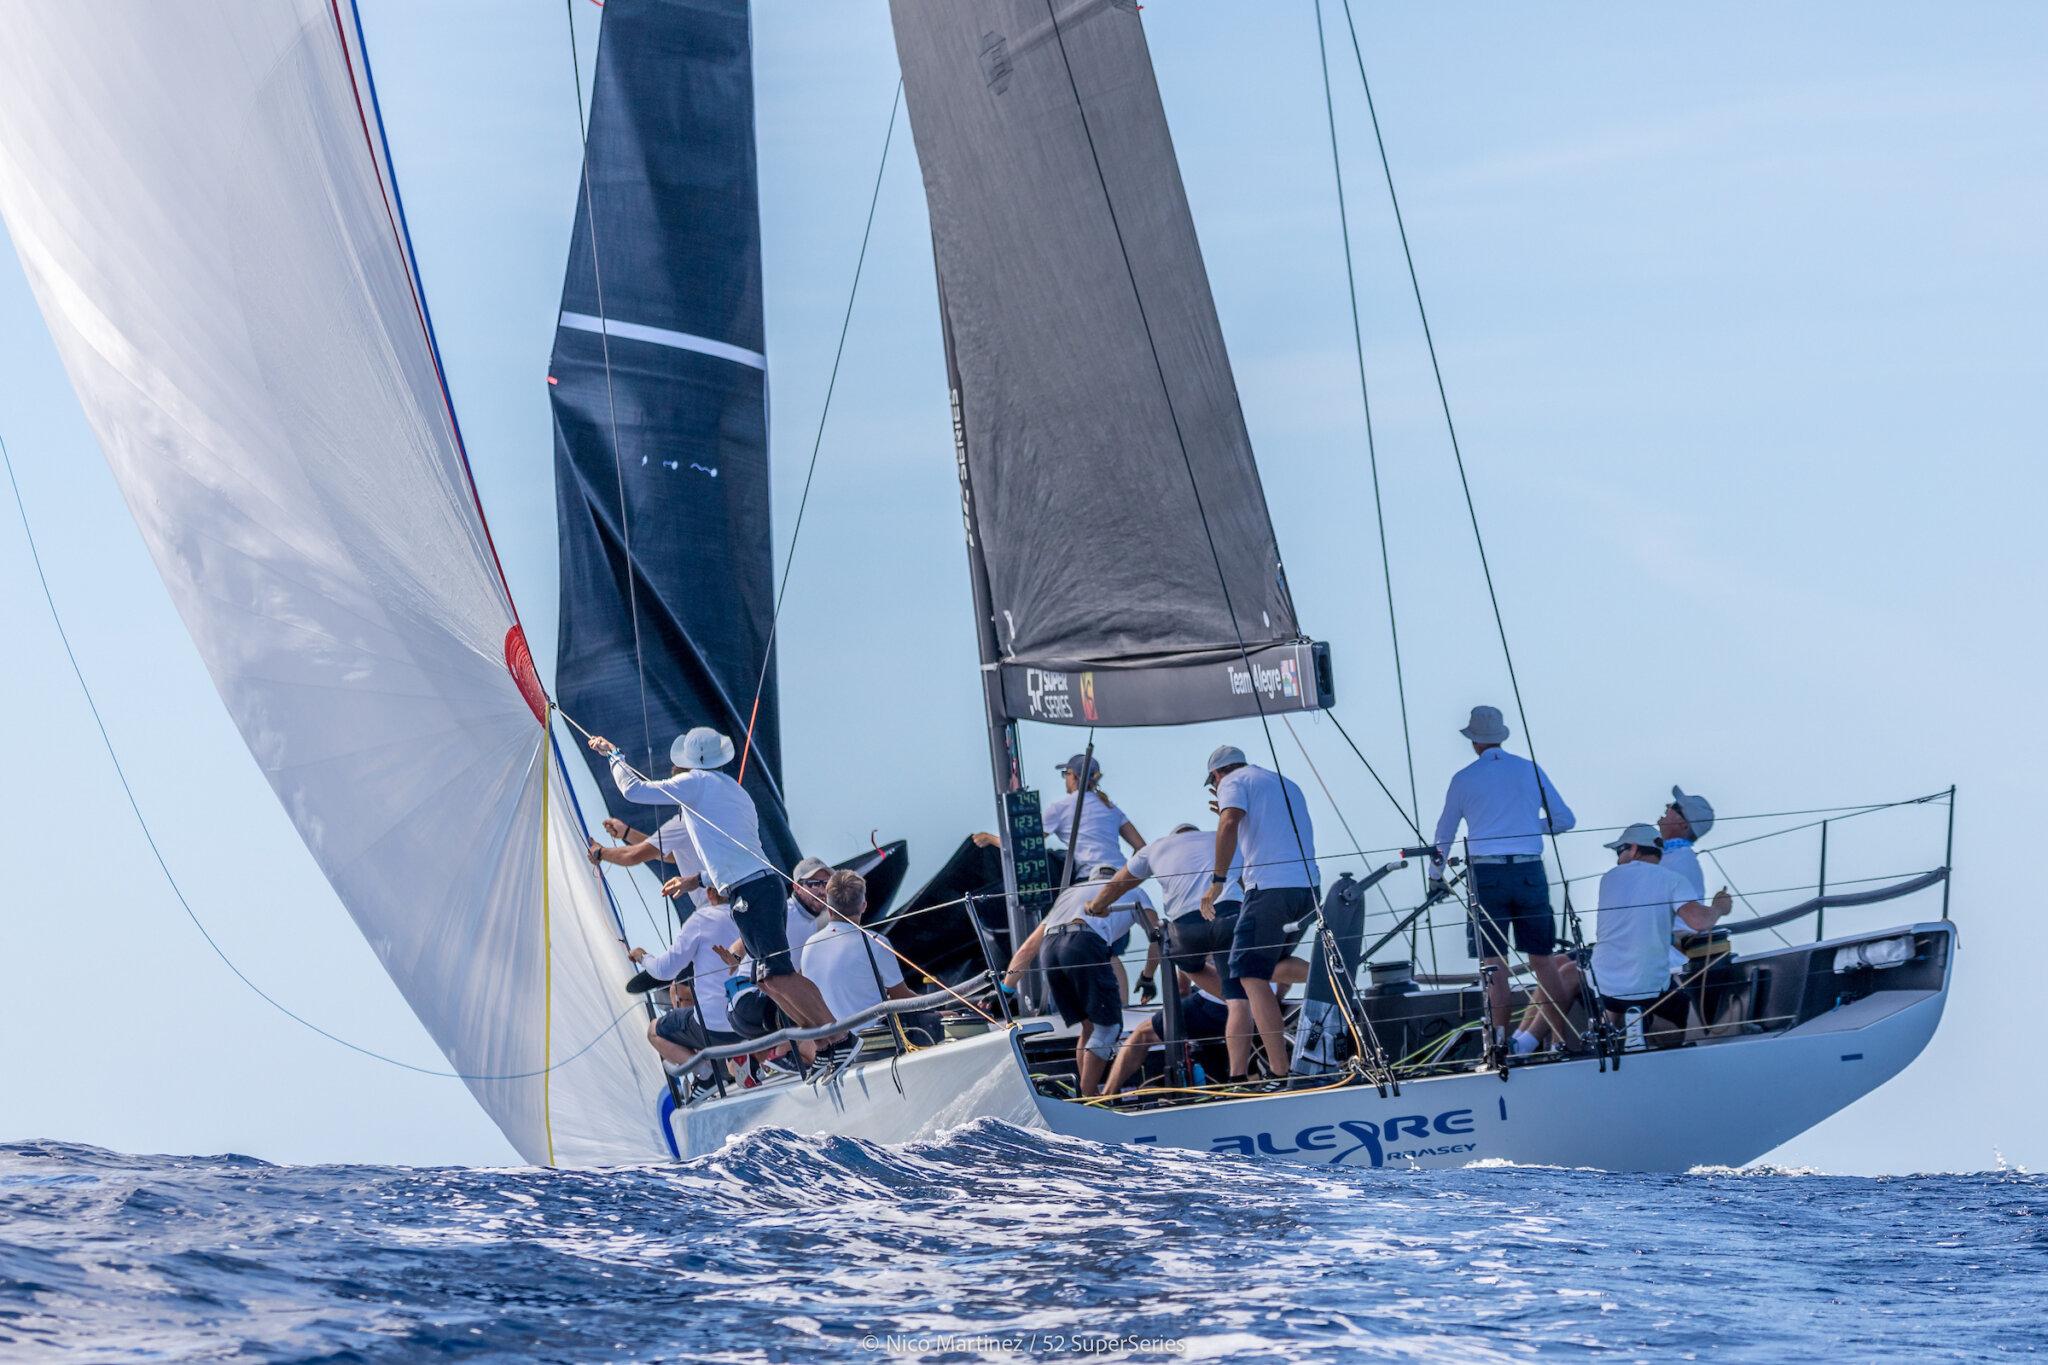 Allegre on a spinnaker reach, crew healing the boat to leeward.